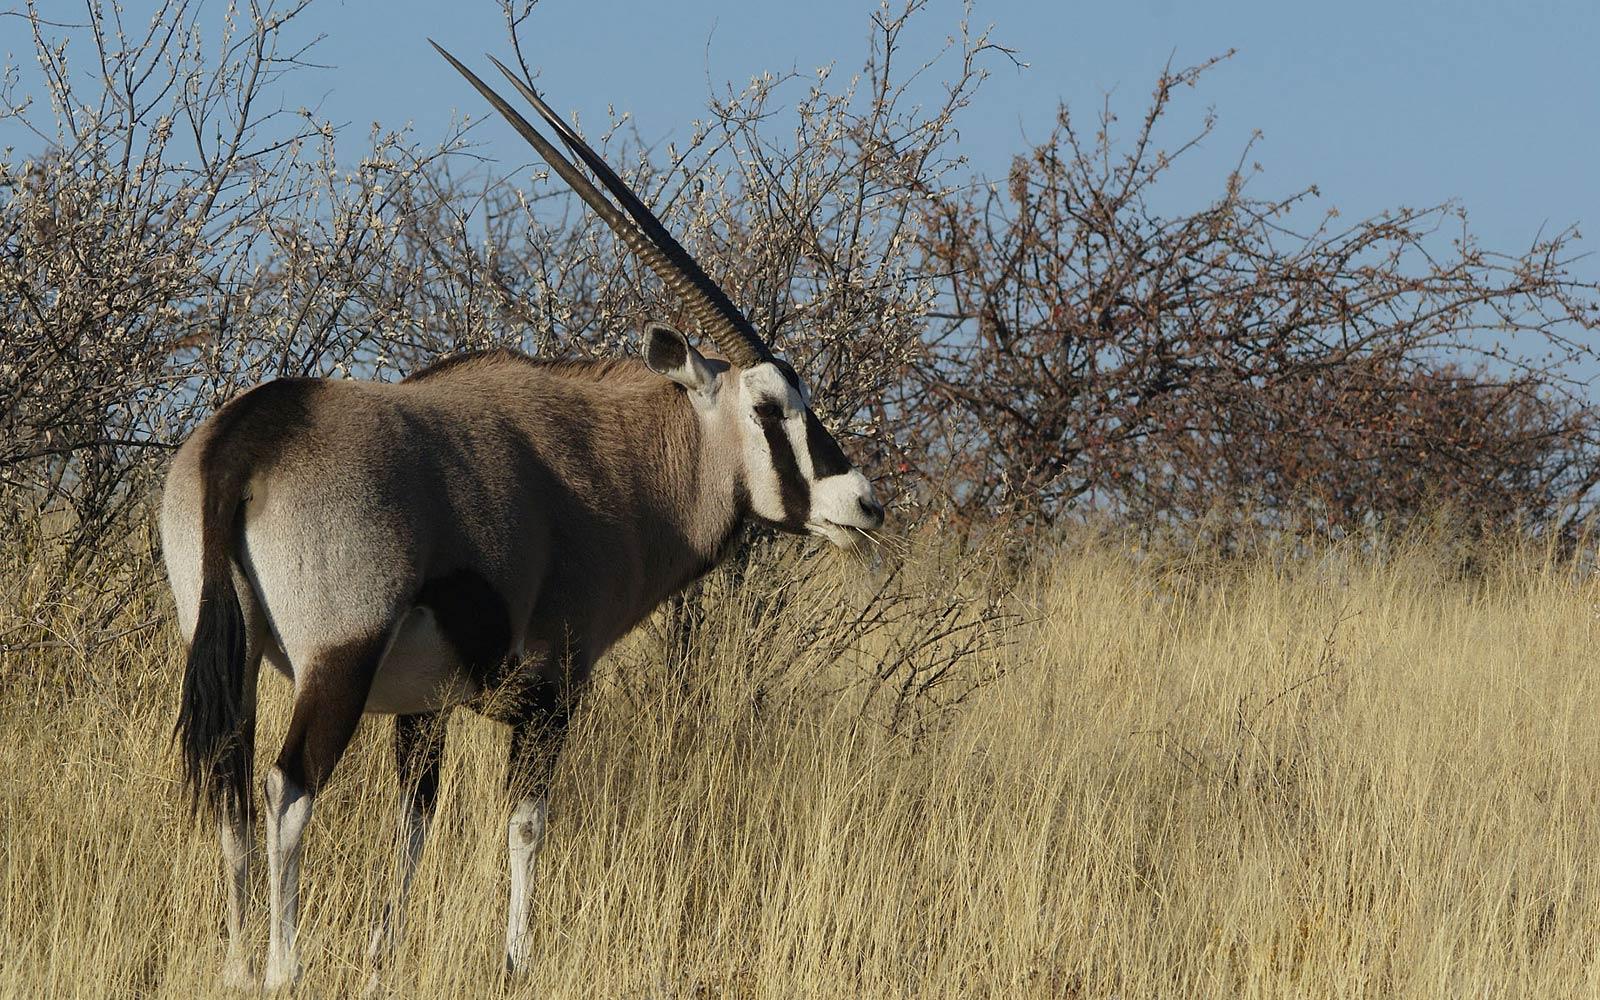 oryx wallpaper